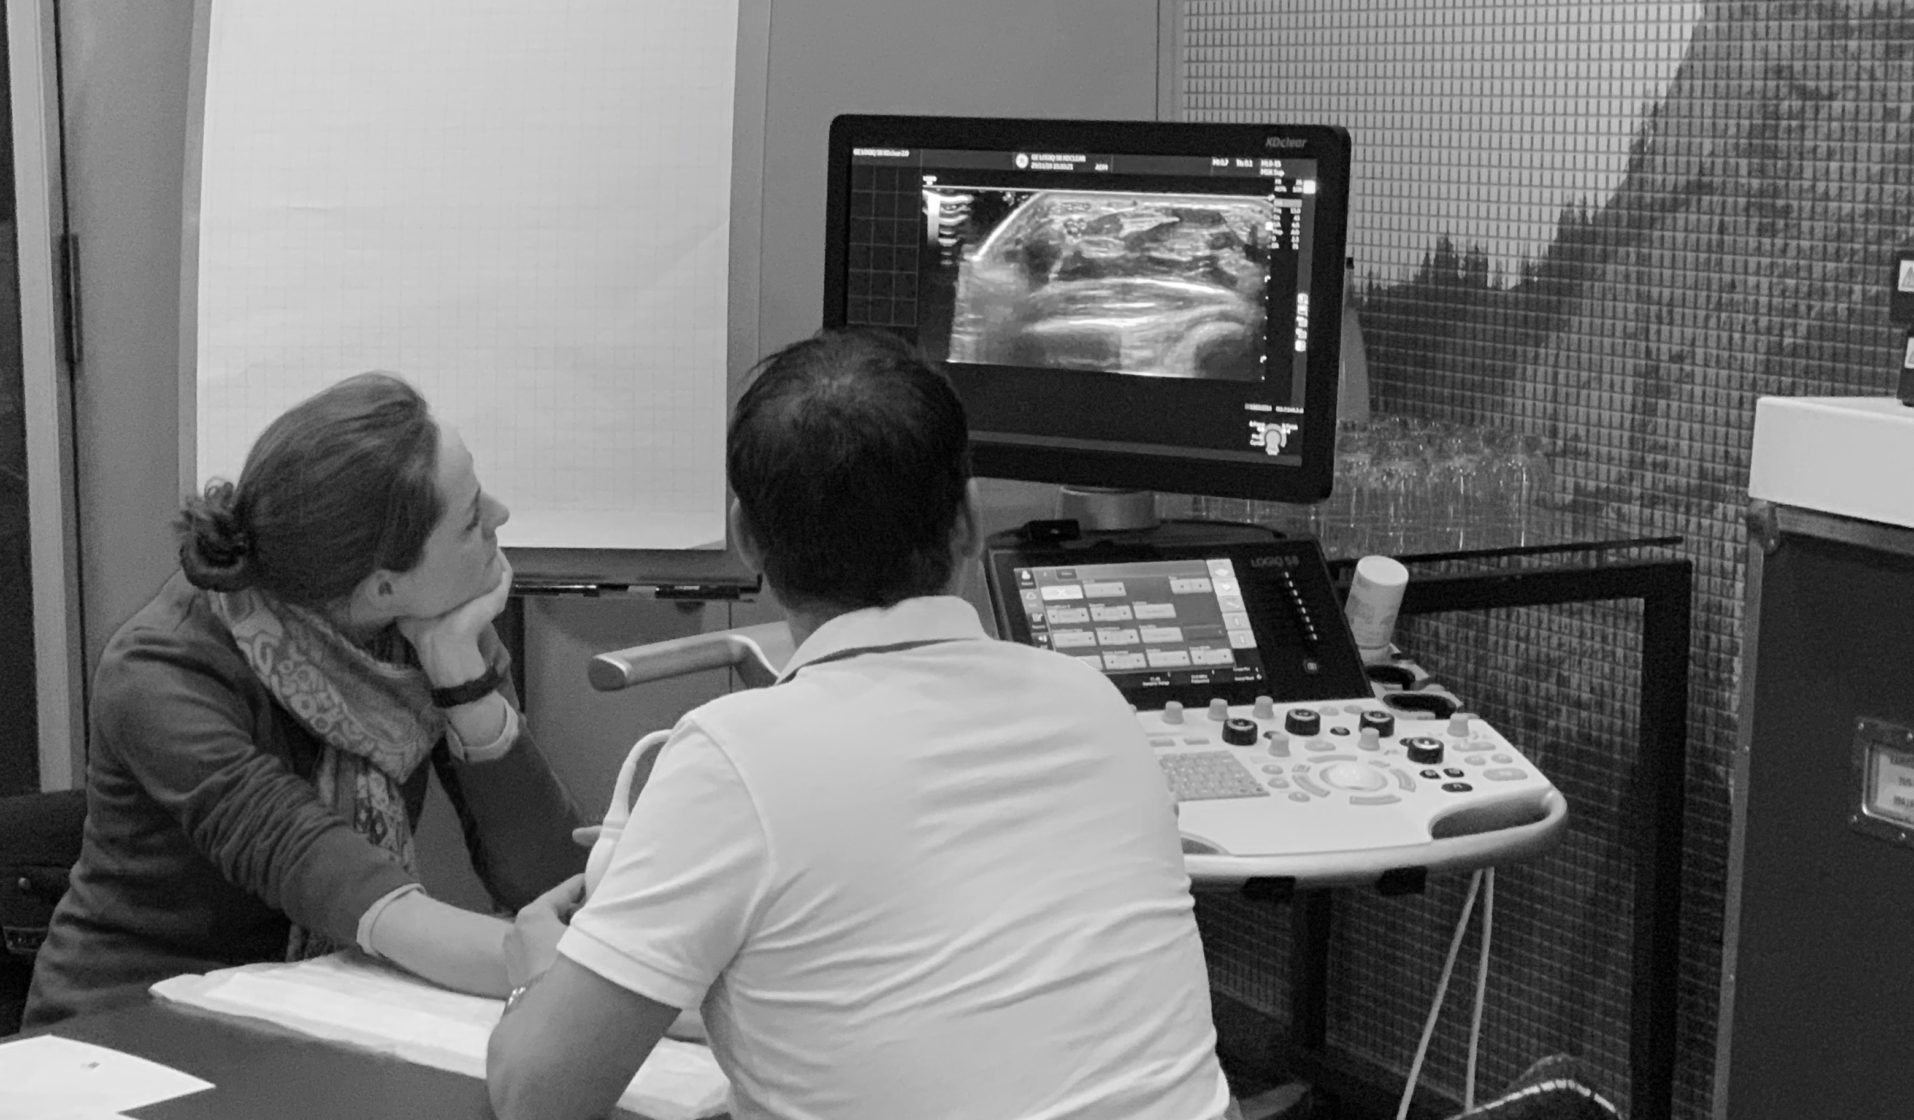 Fortbildungskurs Ultraschalldiagnostik der Hand | Dr. Sebastian Kluge | Handchirurgie Seefeld